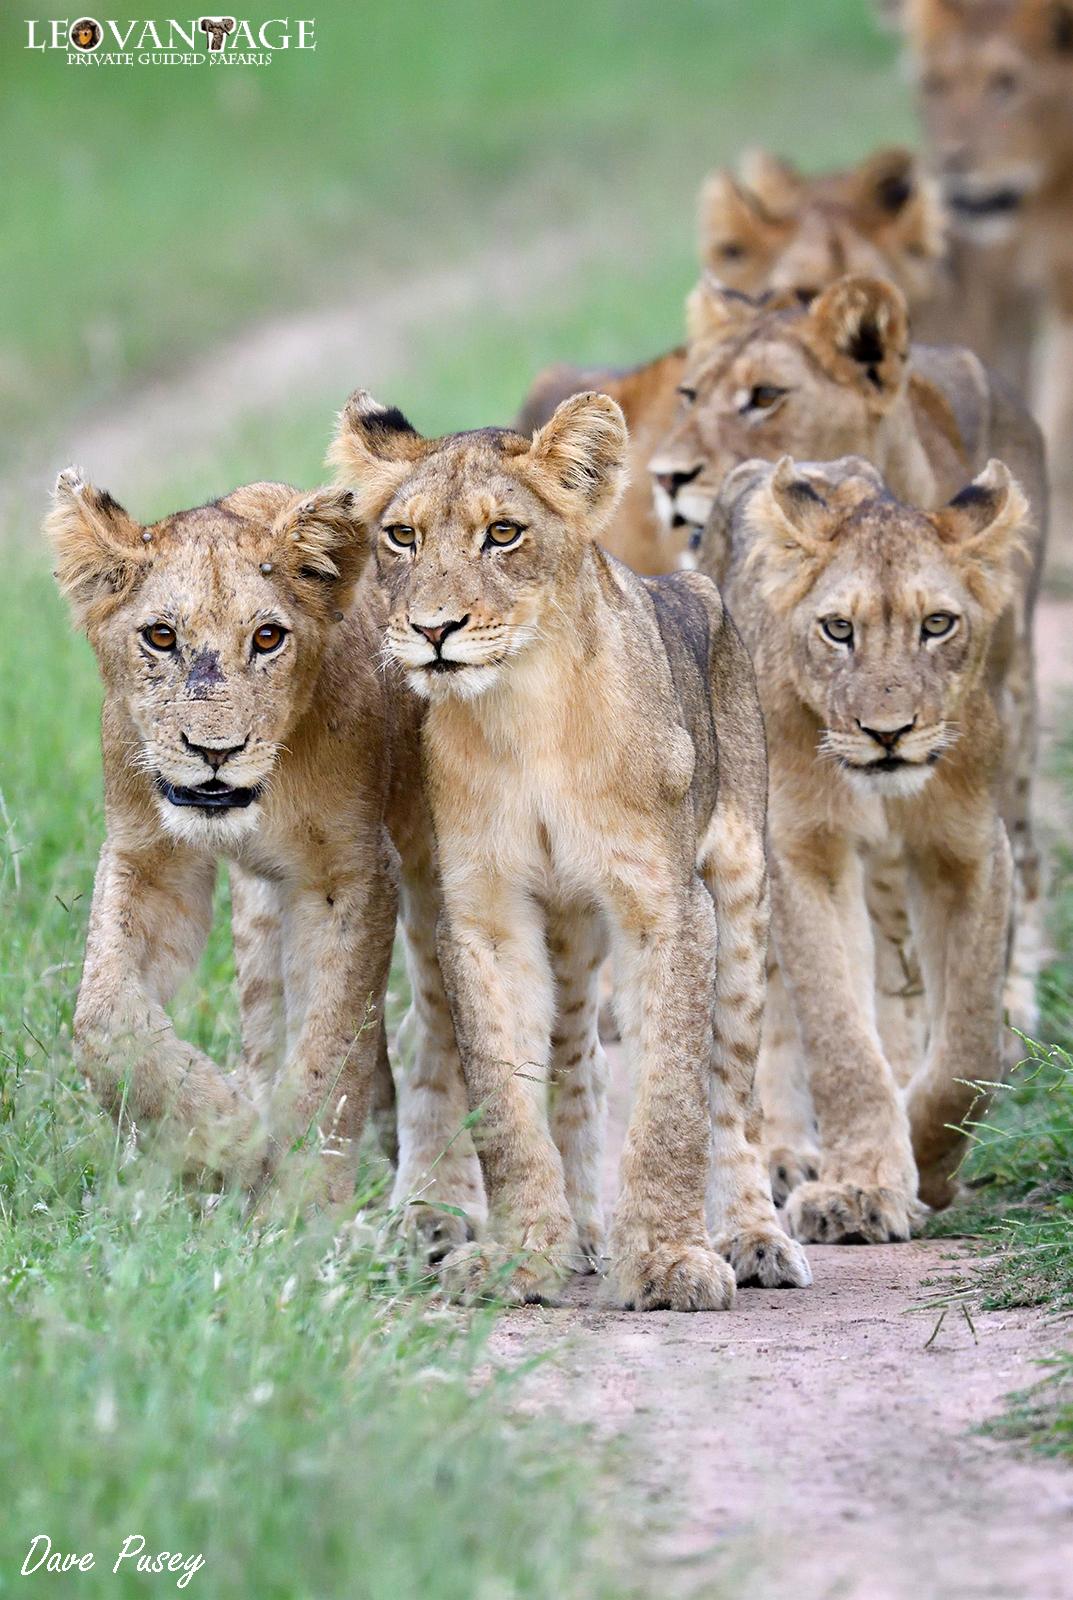 Future leaders of the pride